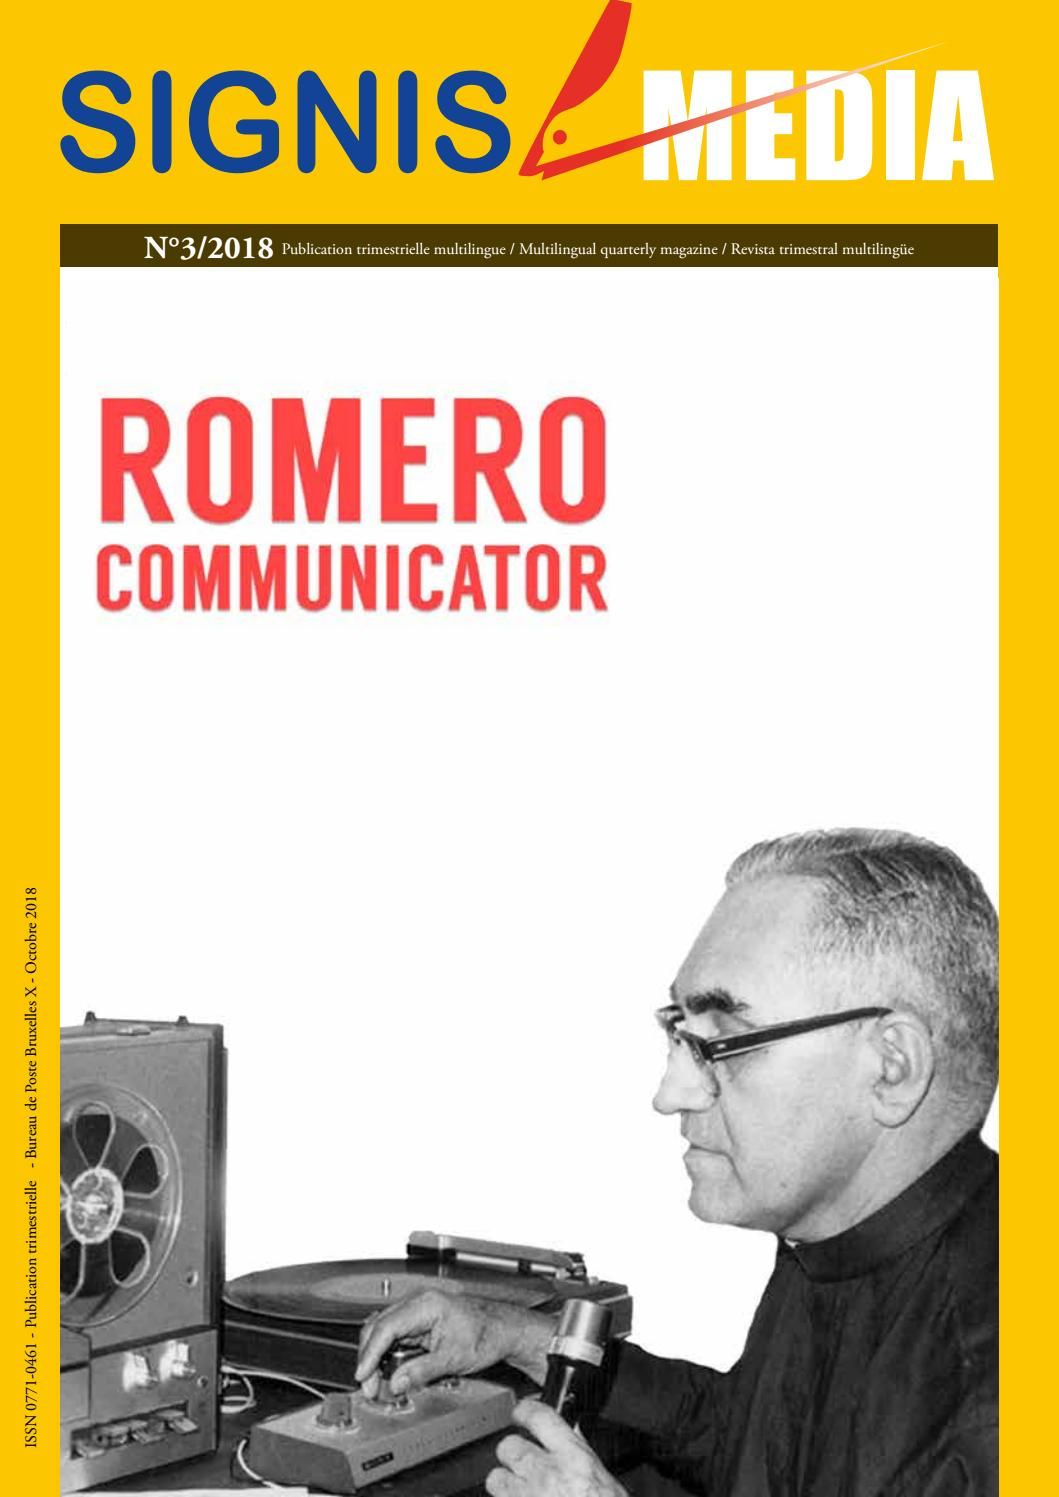 Signis Media Romero Communicator By Signis Issuu